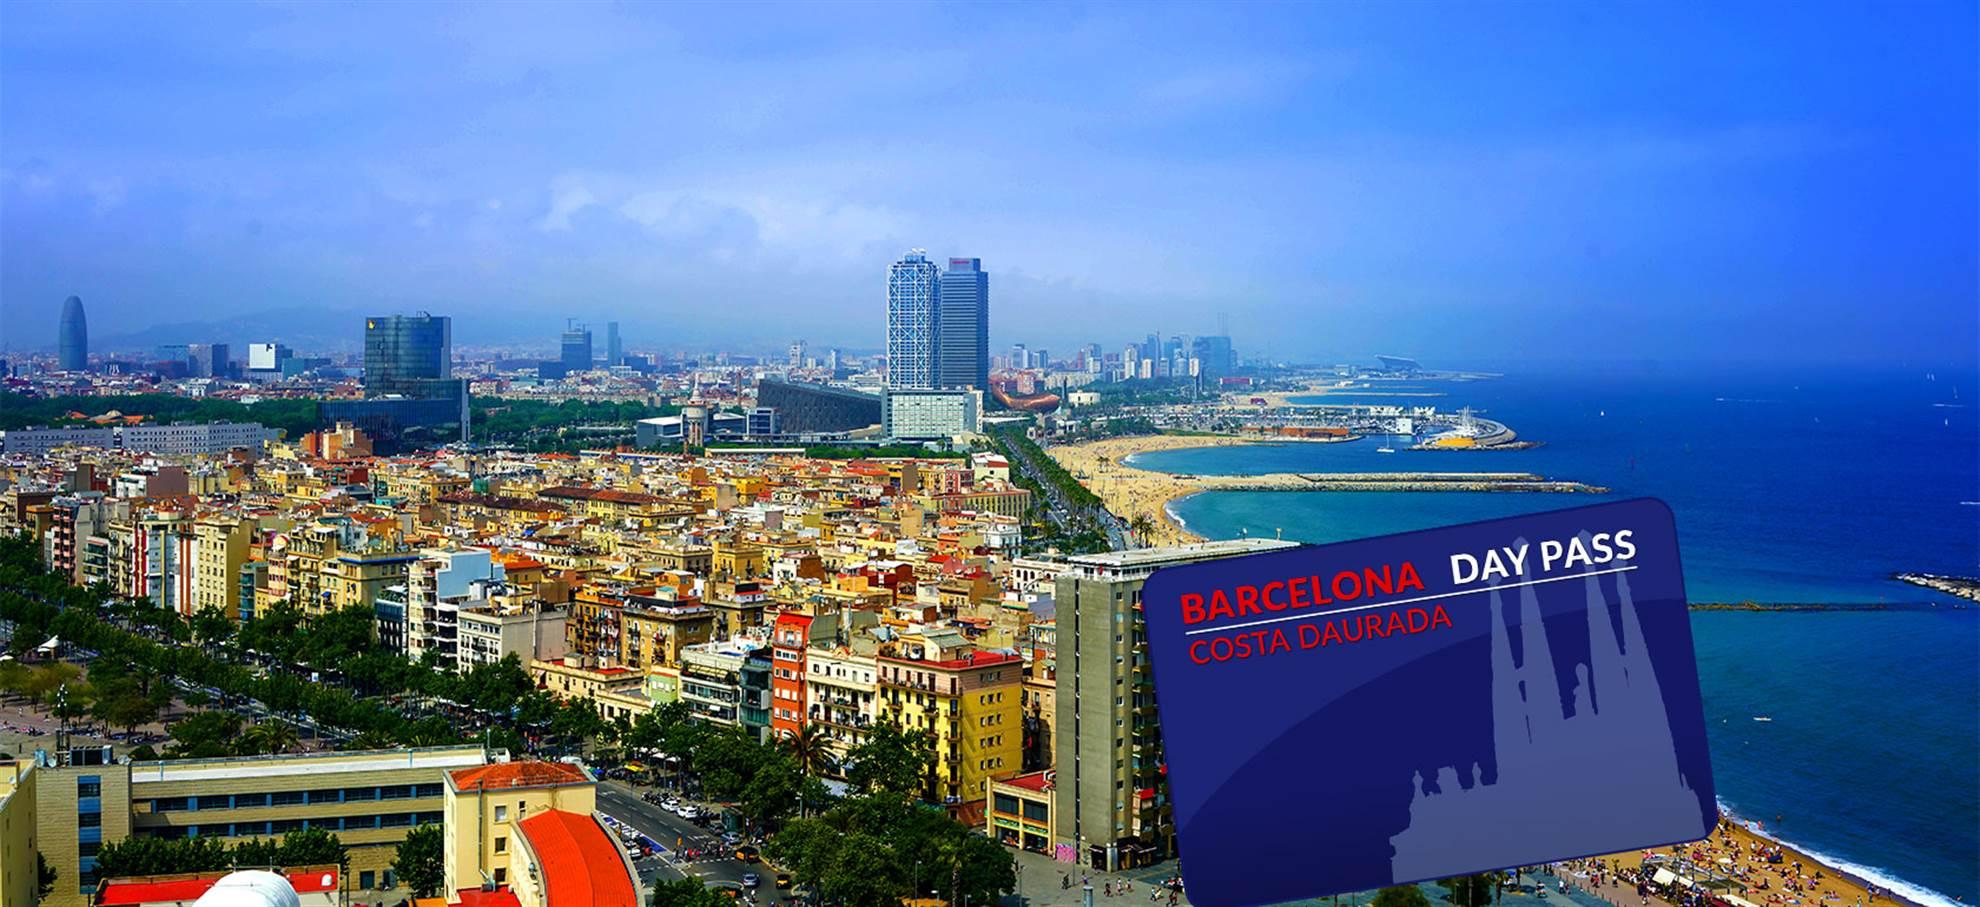 Costa Daurada - Barcelone Pass Journée